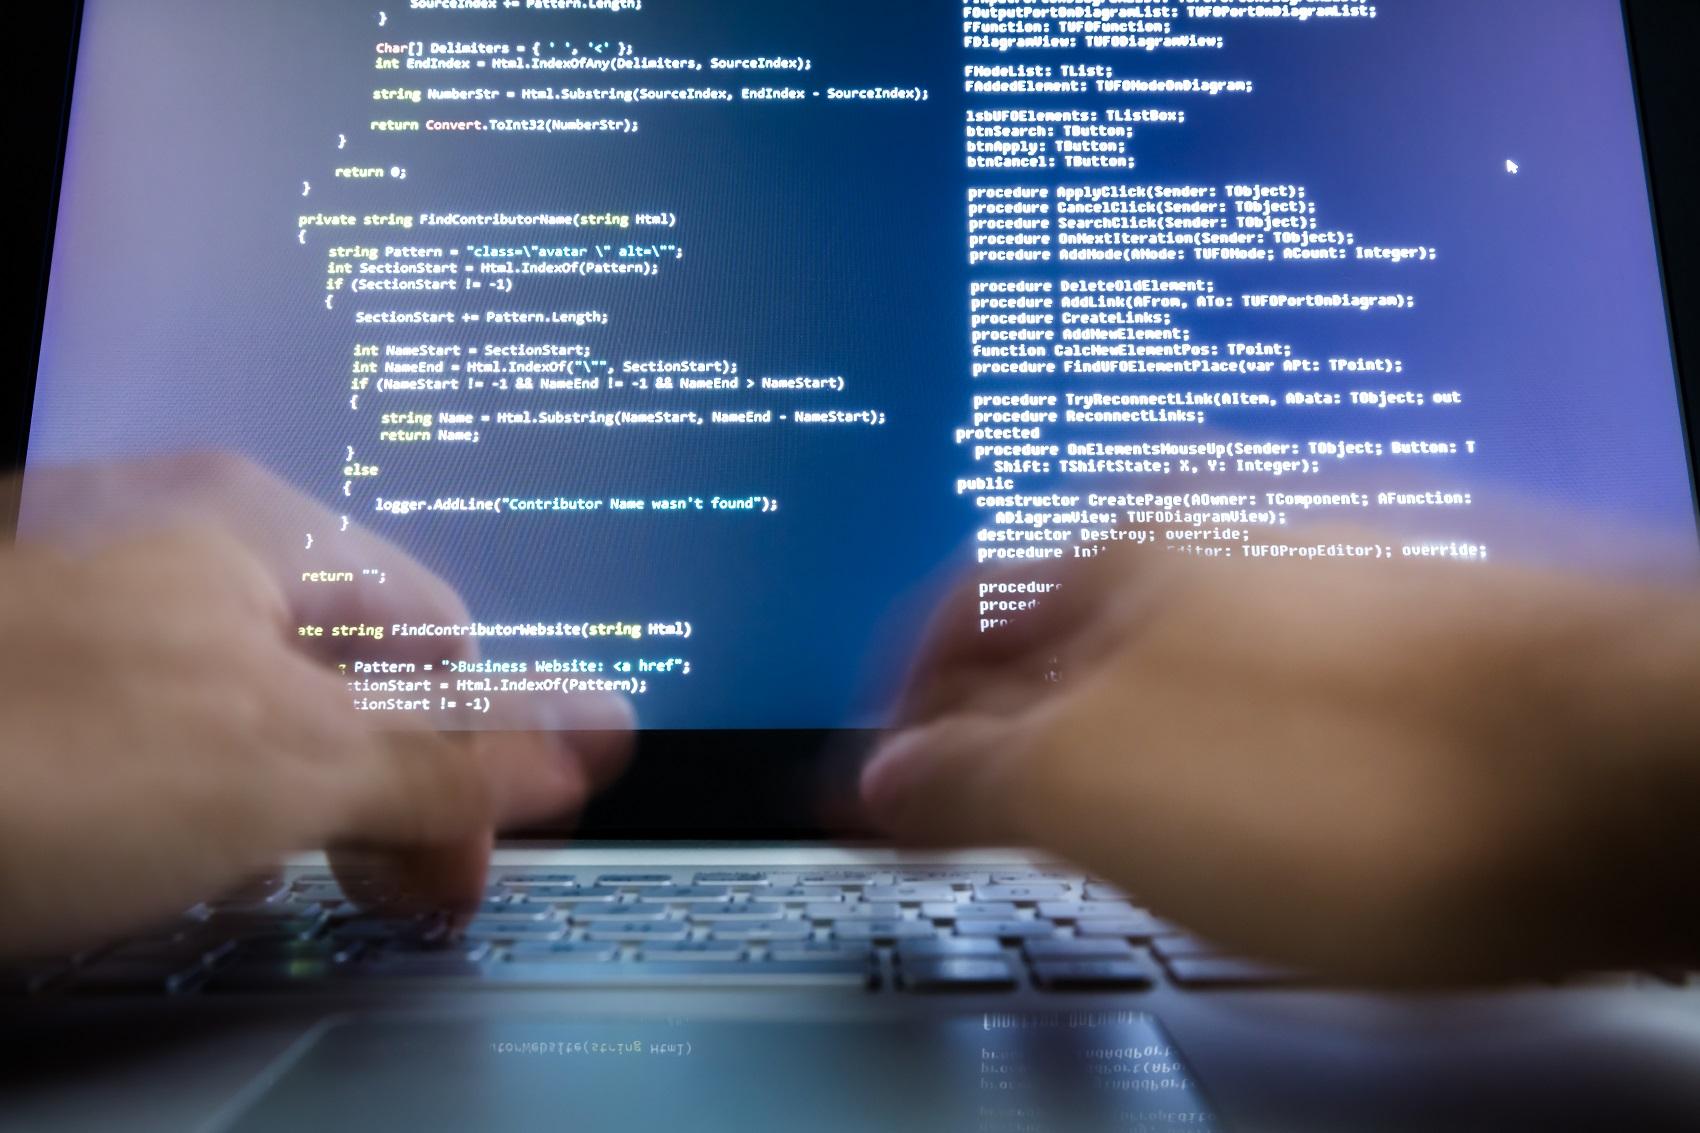 SMEs: should you containerise? TechNative